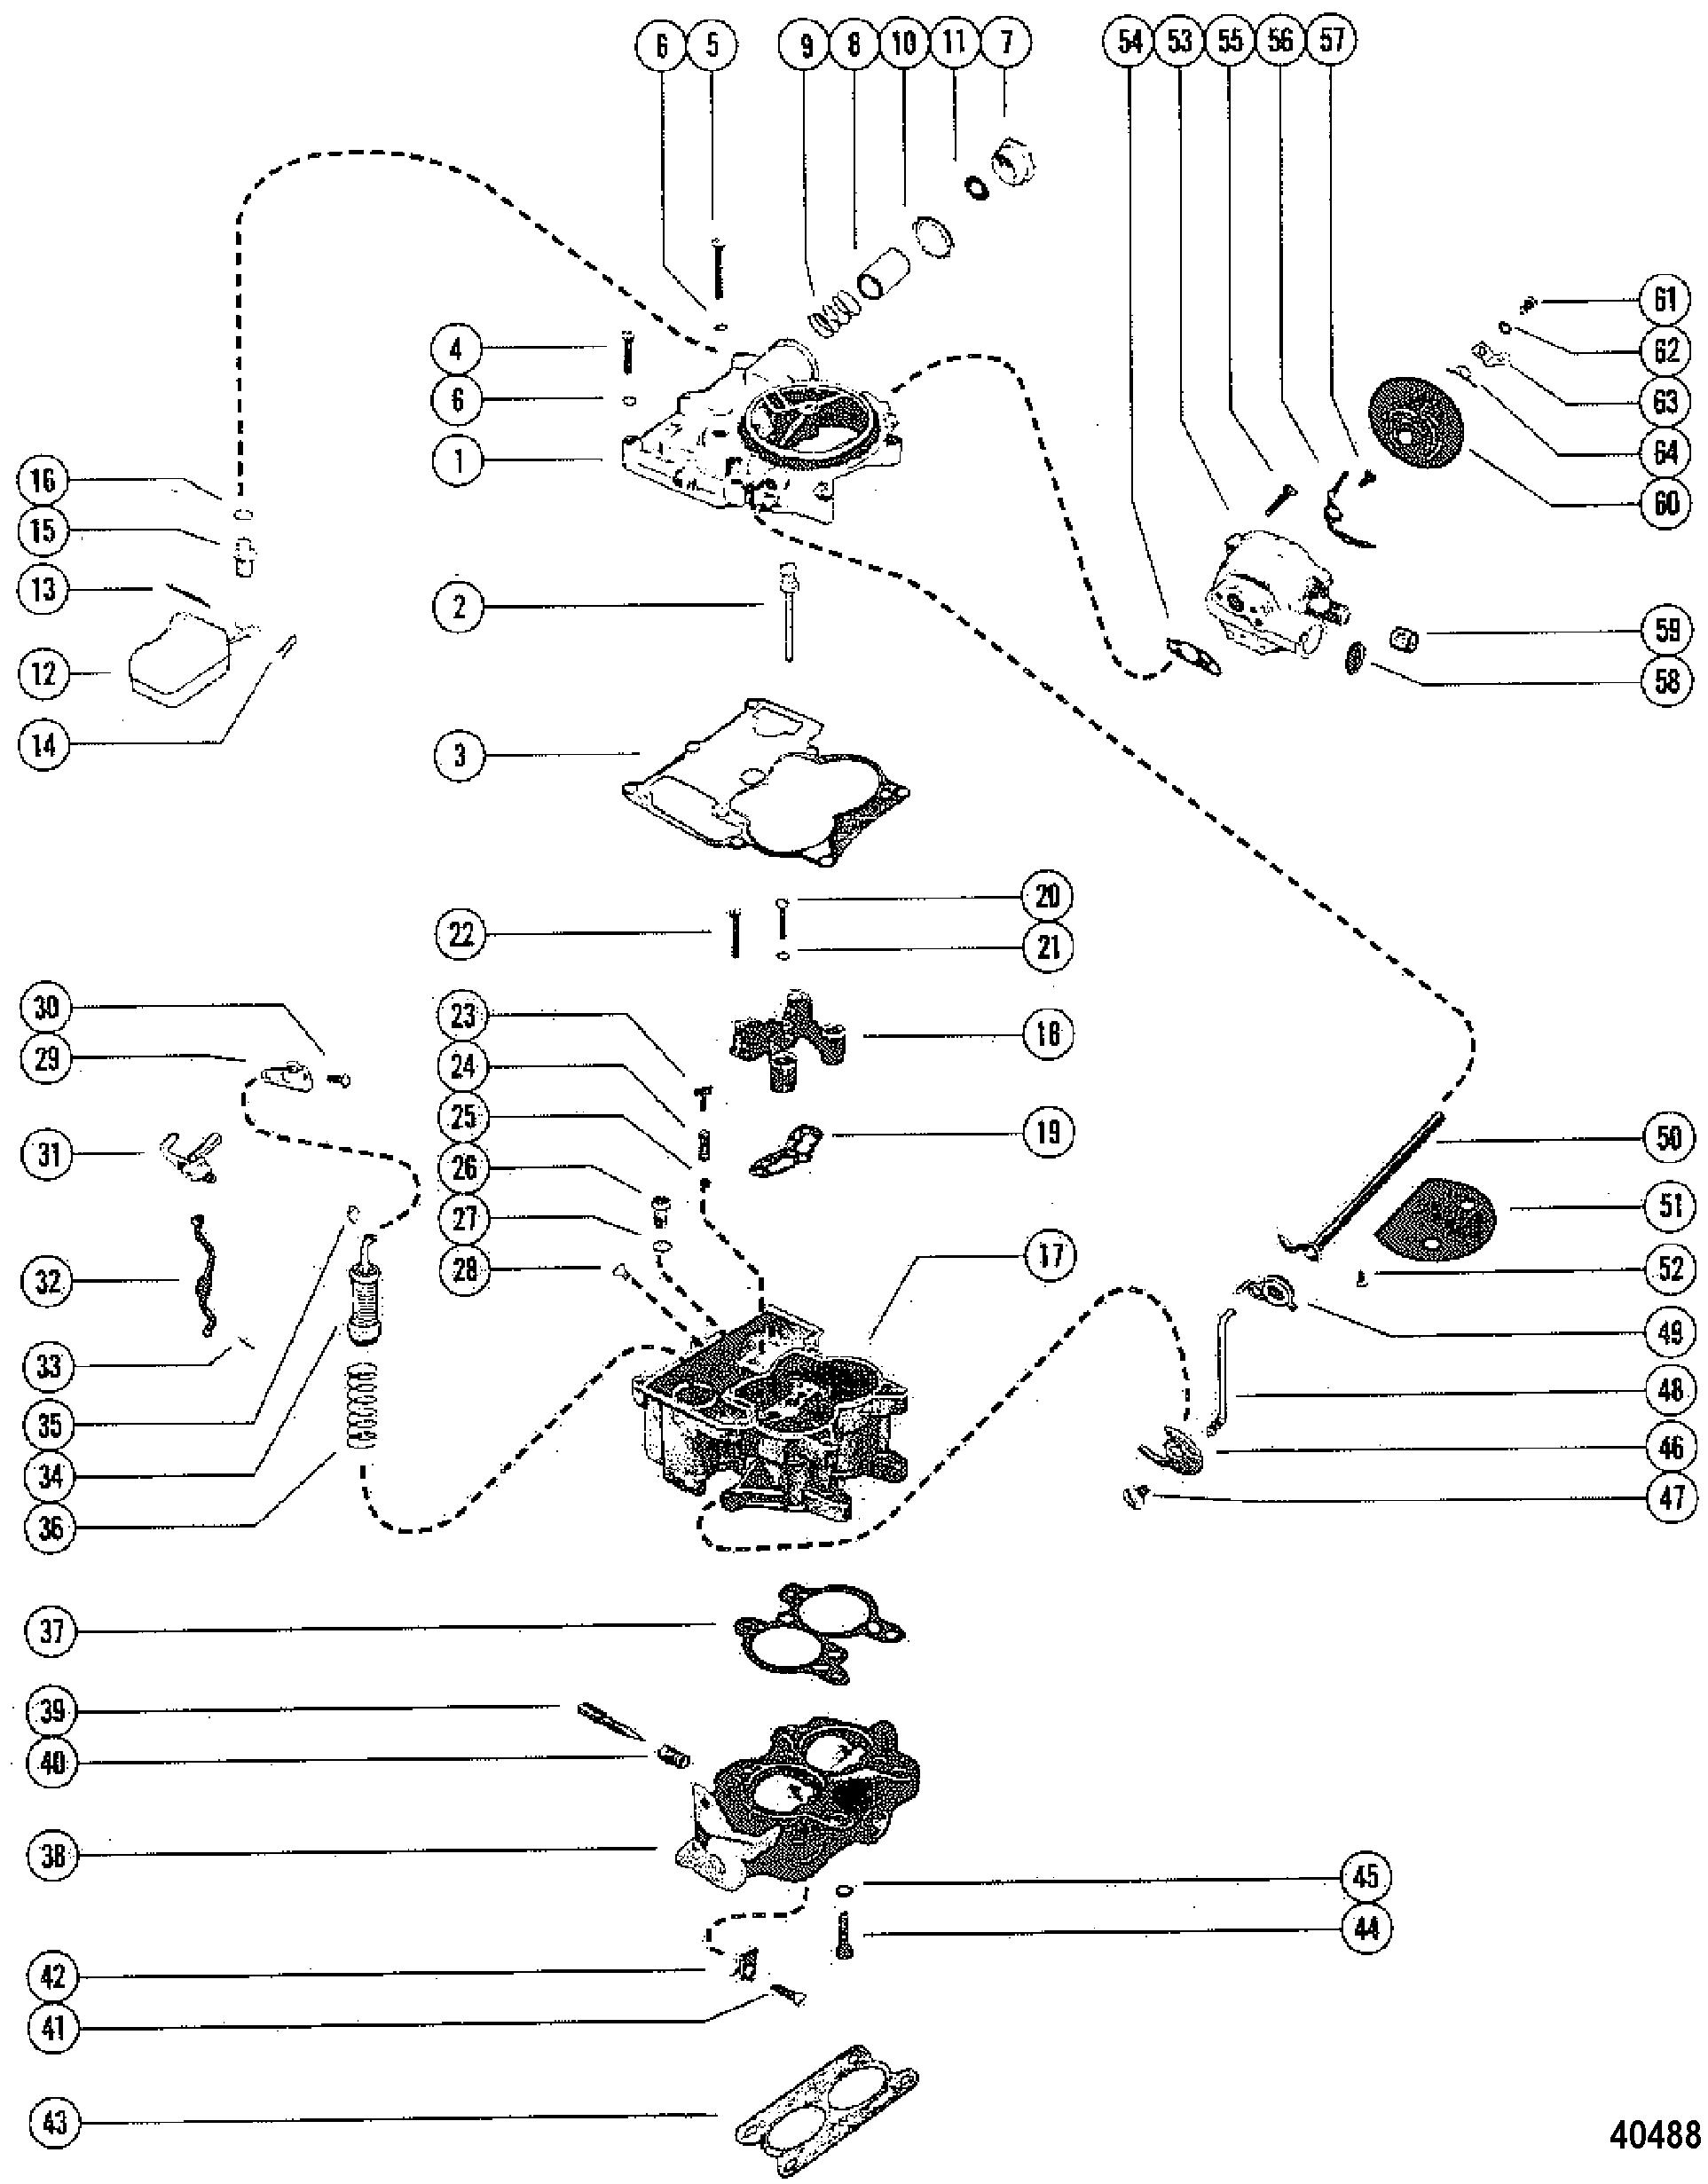 Carburetor Assembly For Mercruiser 470 Engine